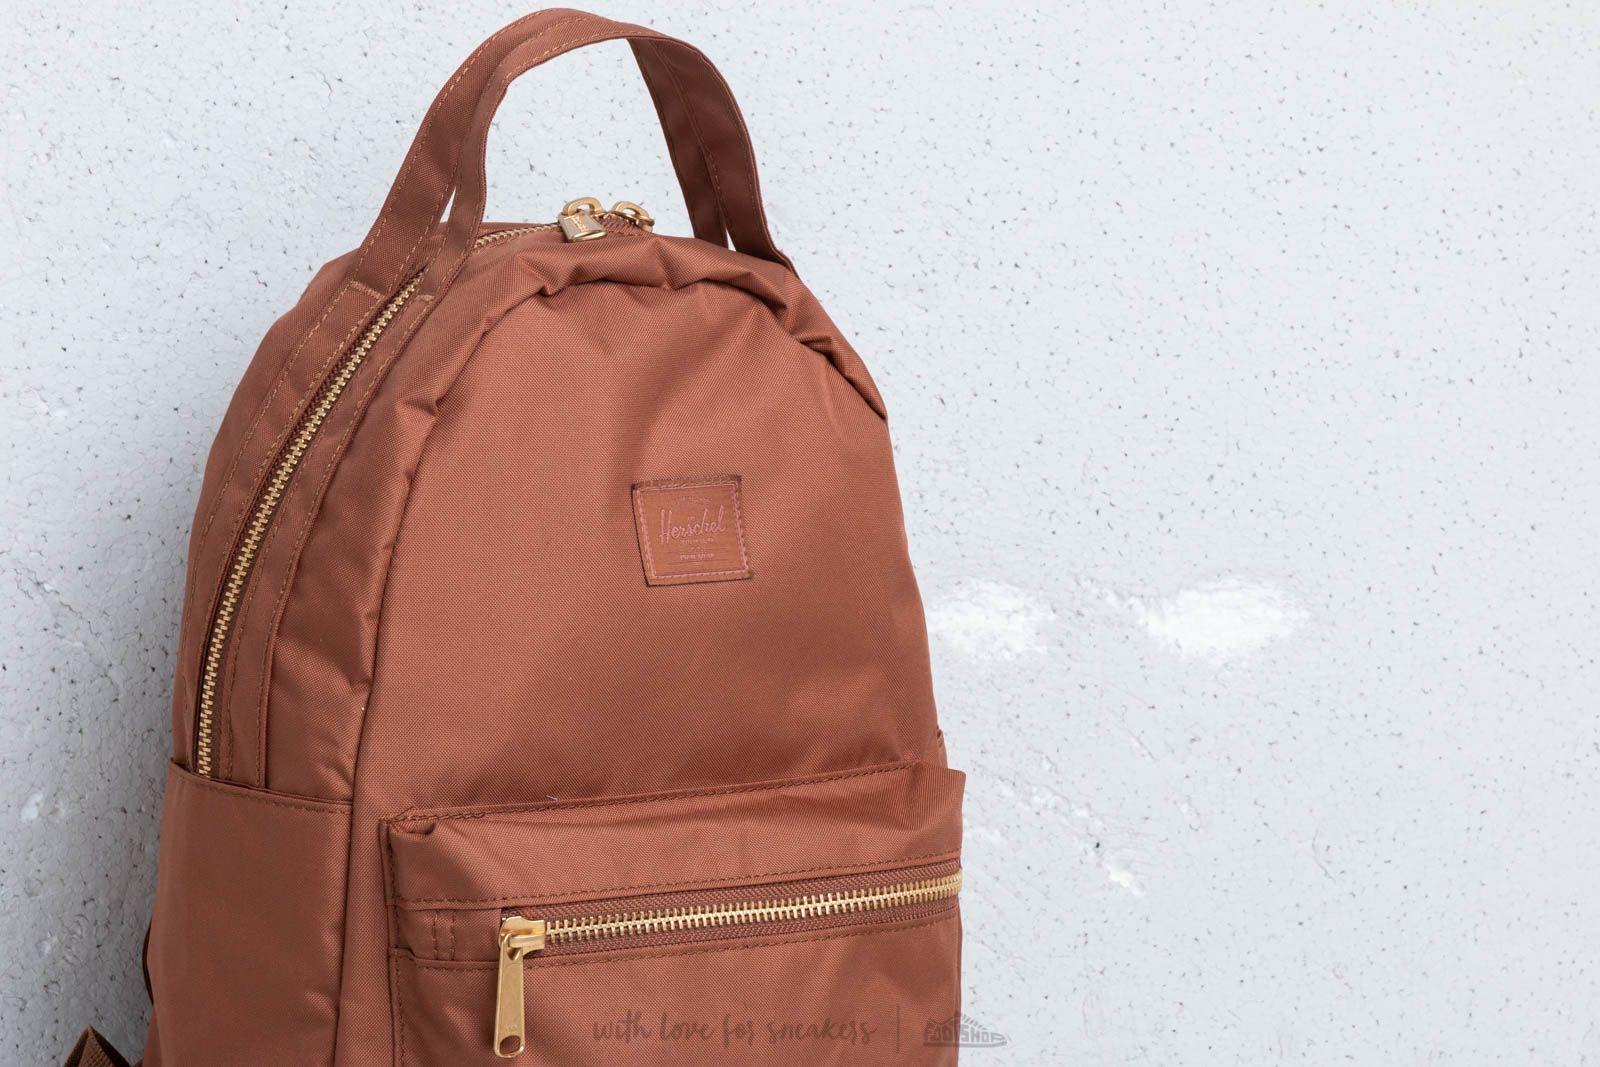 Herschel Supply Co. Light Nova Backpack Saddle Brown at a great price  80  buy at de0a948165079